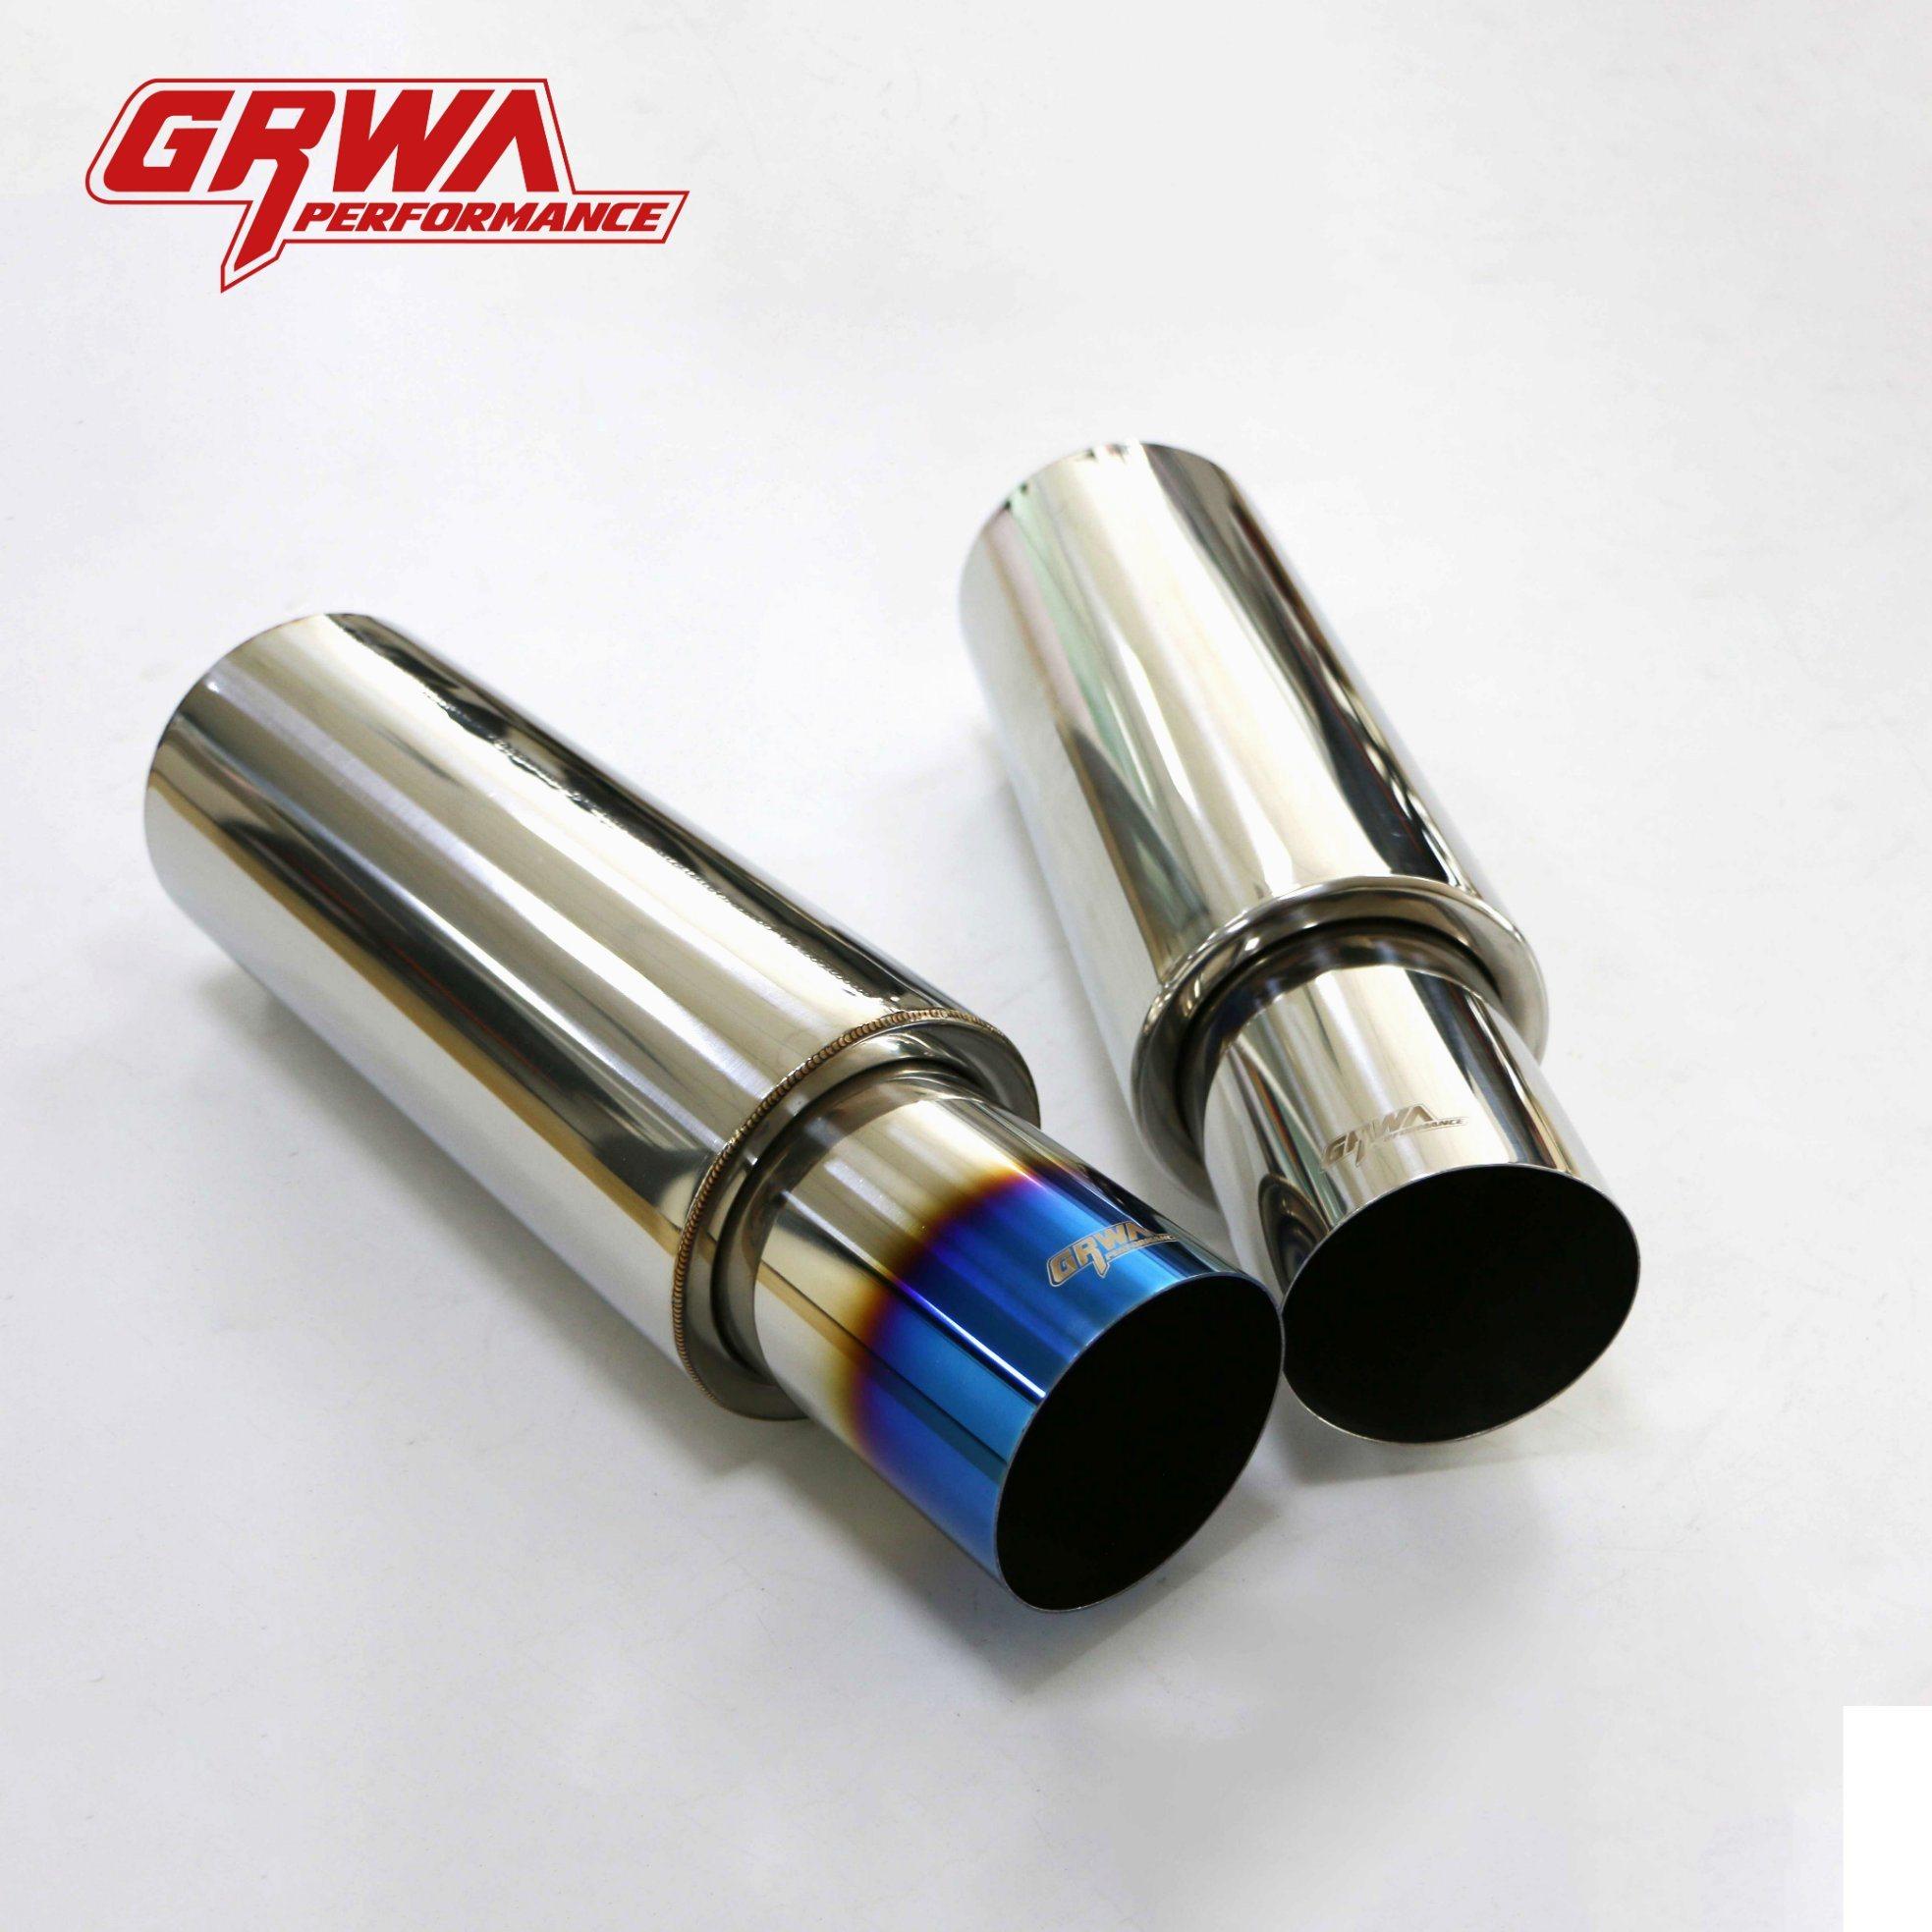 China Mirror Polished Tig Welding Laser Logo Exhaust Muffler Silencer China Muffler Shop Exhaust Muffler